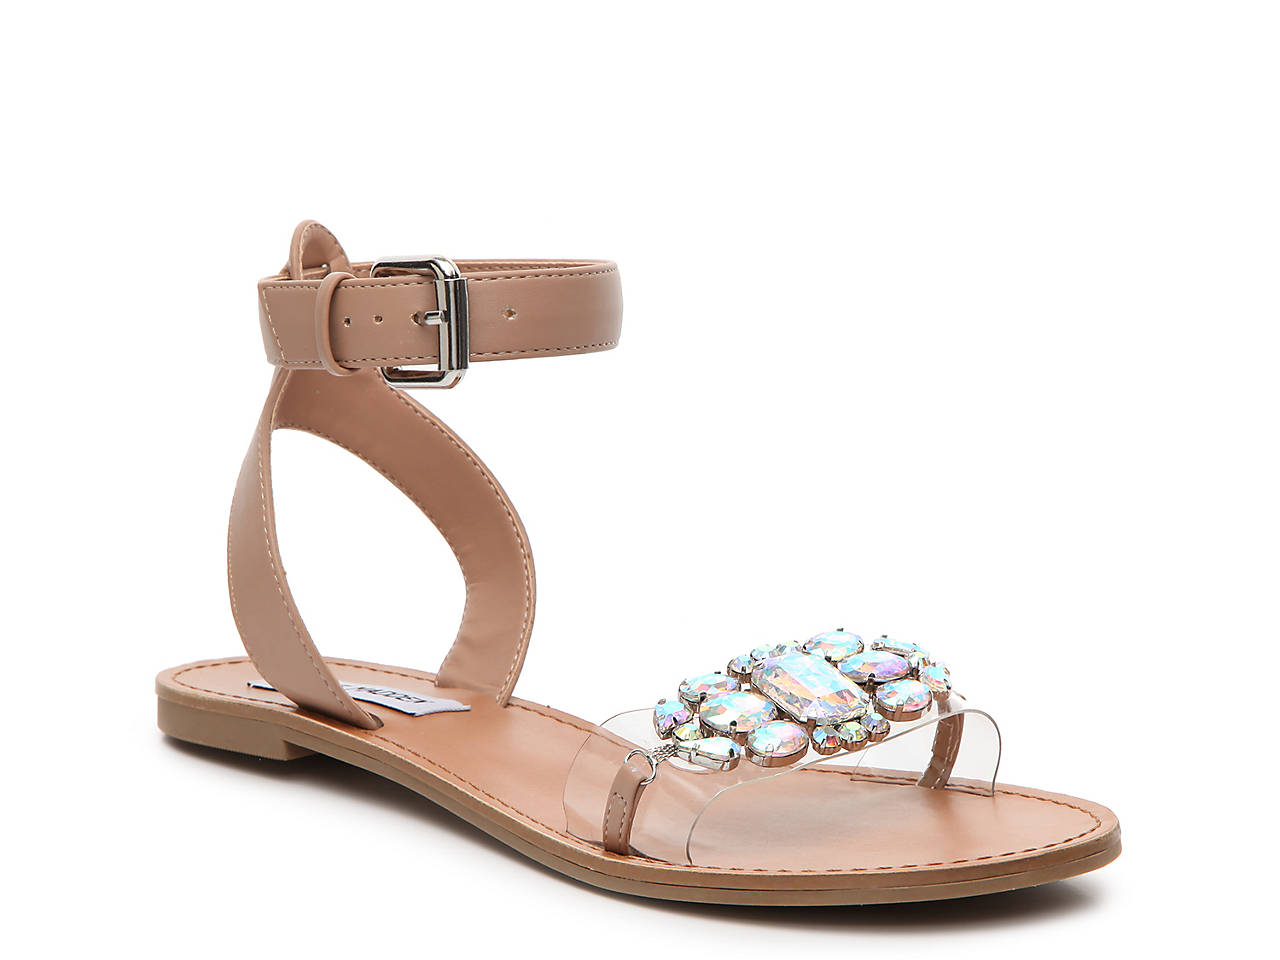 336944320d7 Steve Madden Layla Sandal Women s Shoes